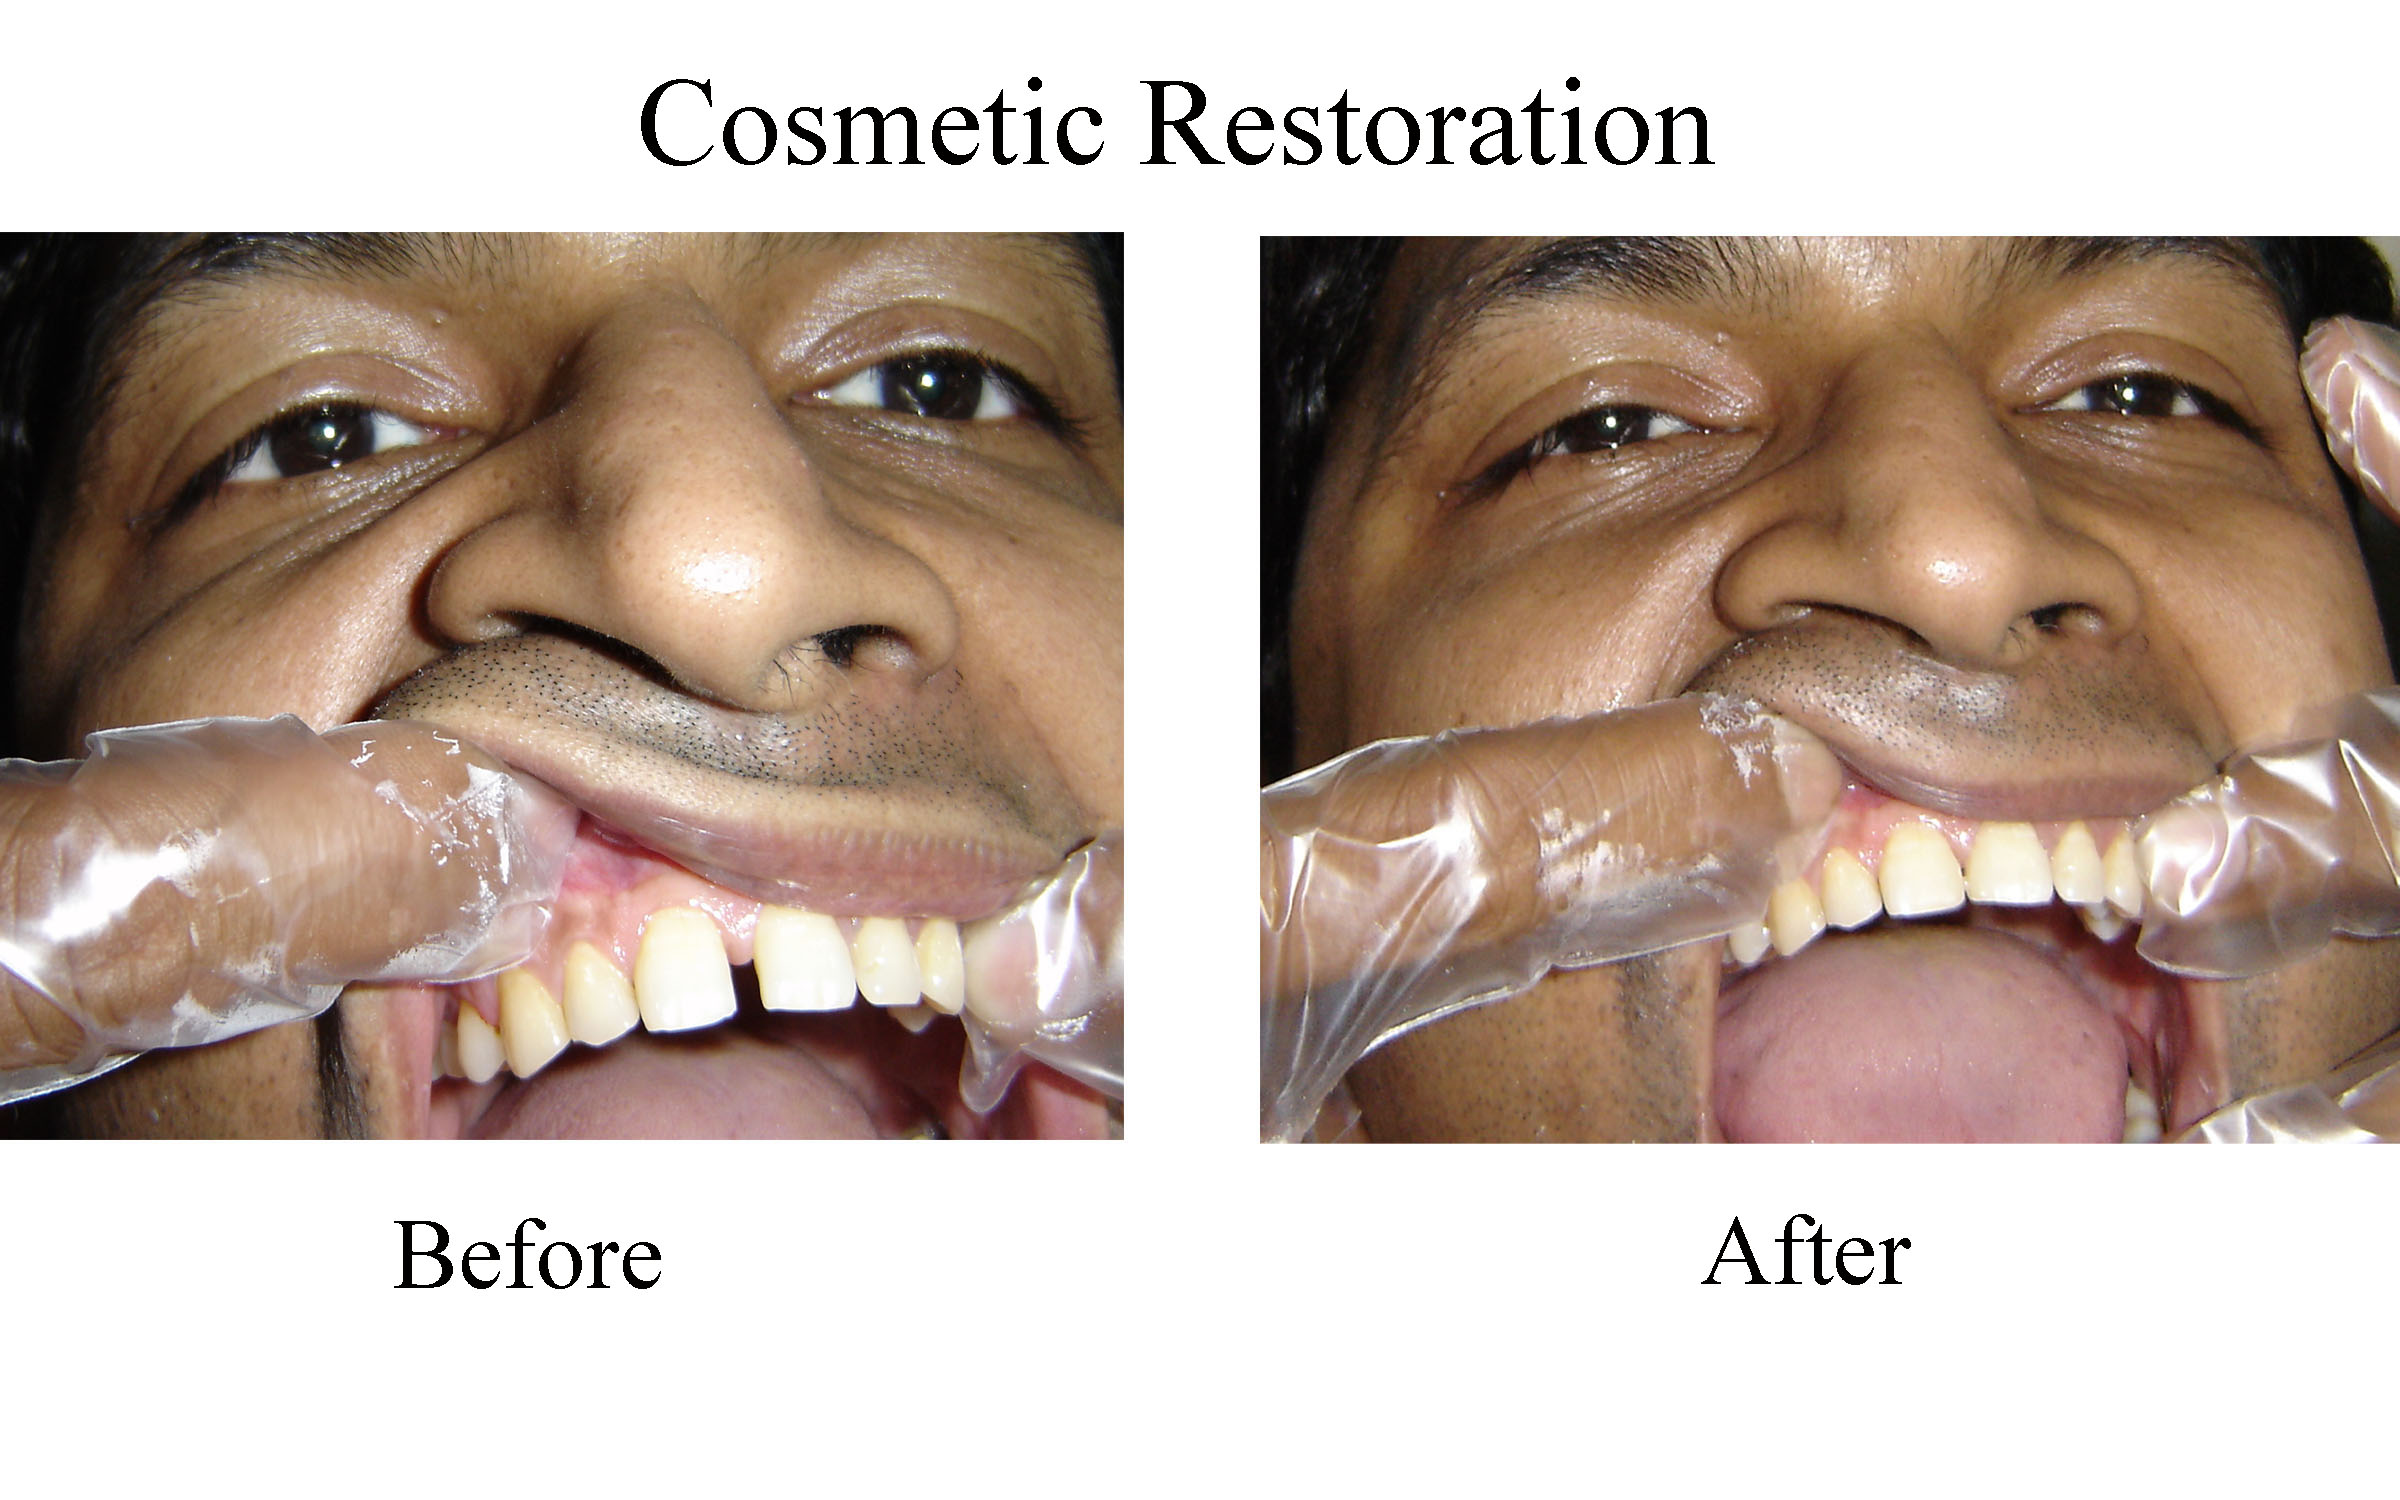 Xcellent Dentistry